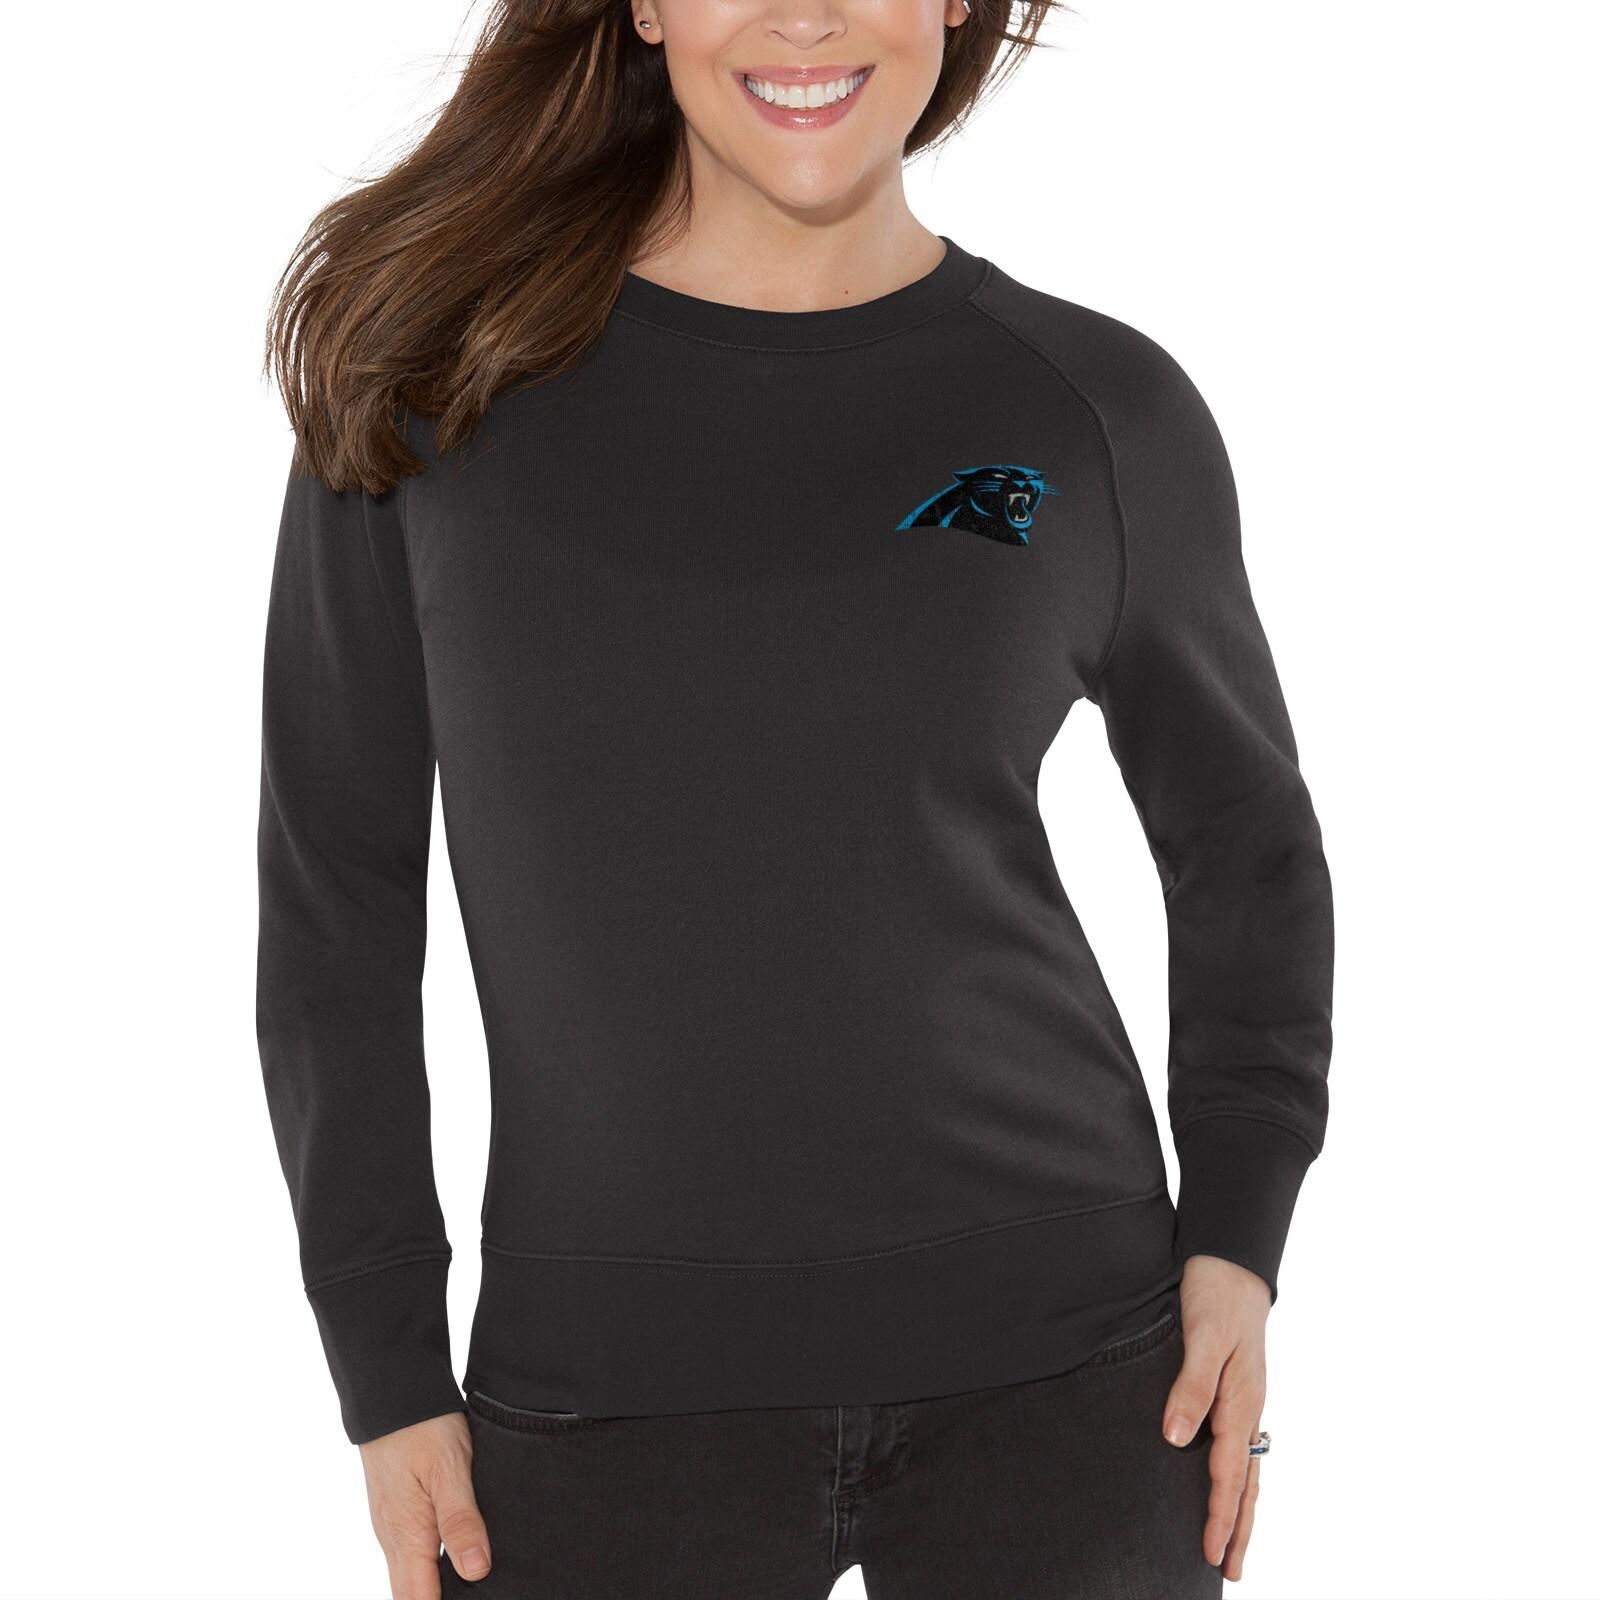 Carolina Panthers Touch by Alyssa Milano Women's Star Player Sweatshirt - Black